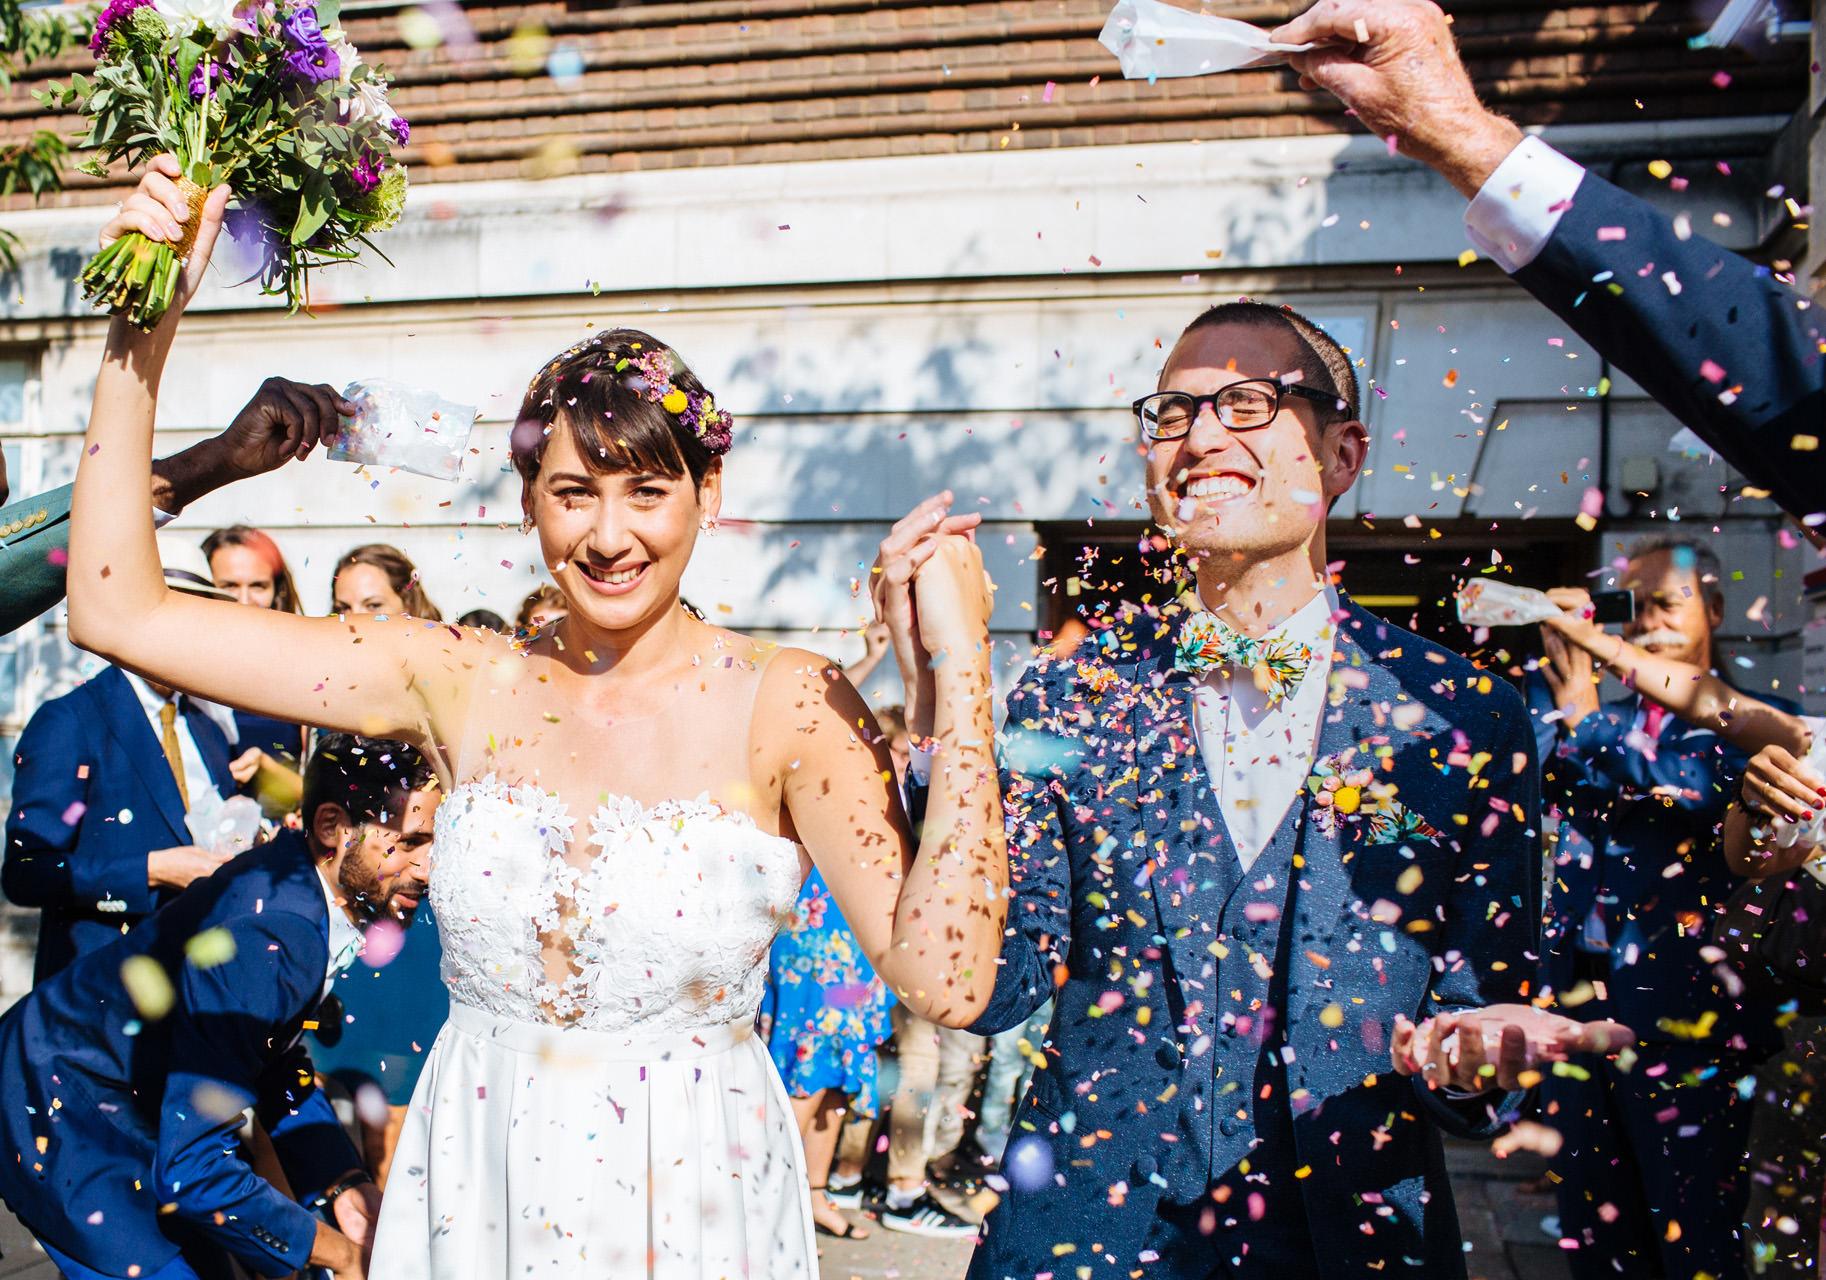 Hammersmith town hall wedding confetti